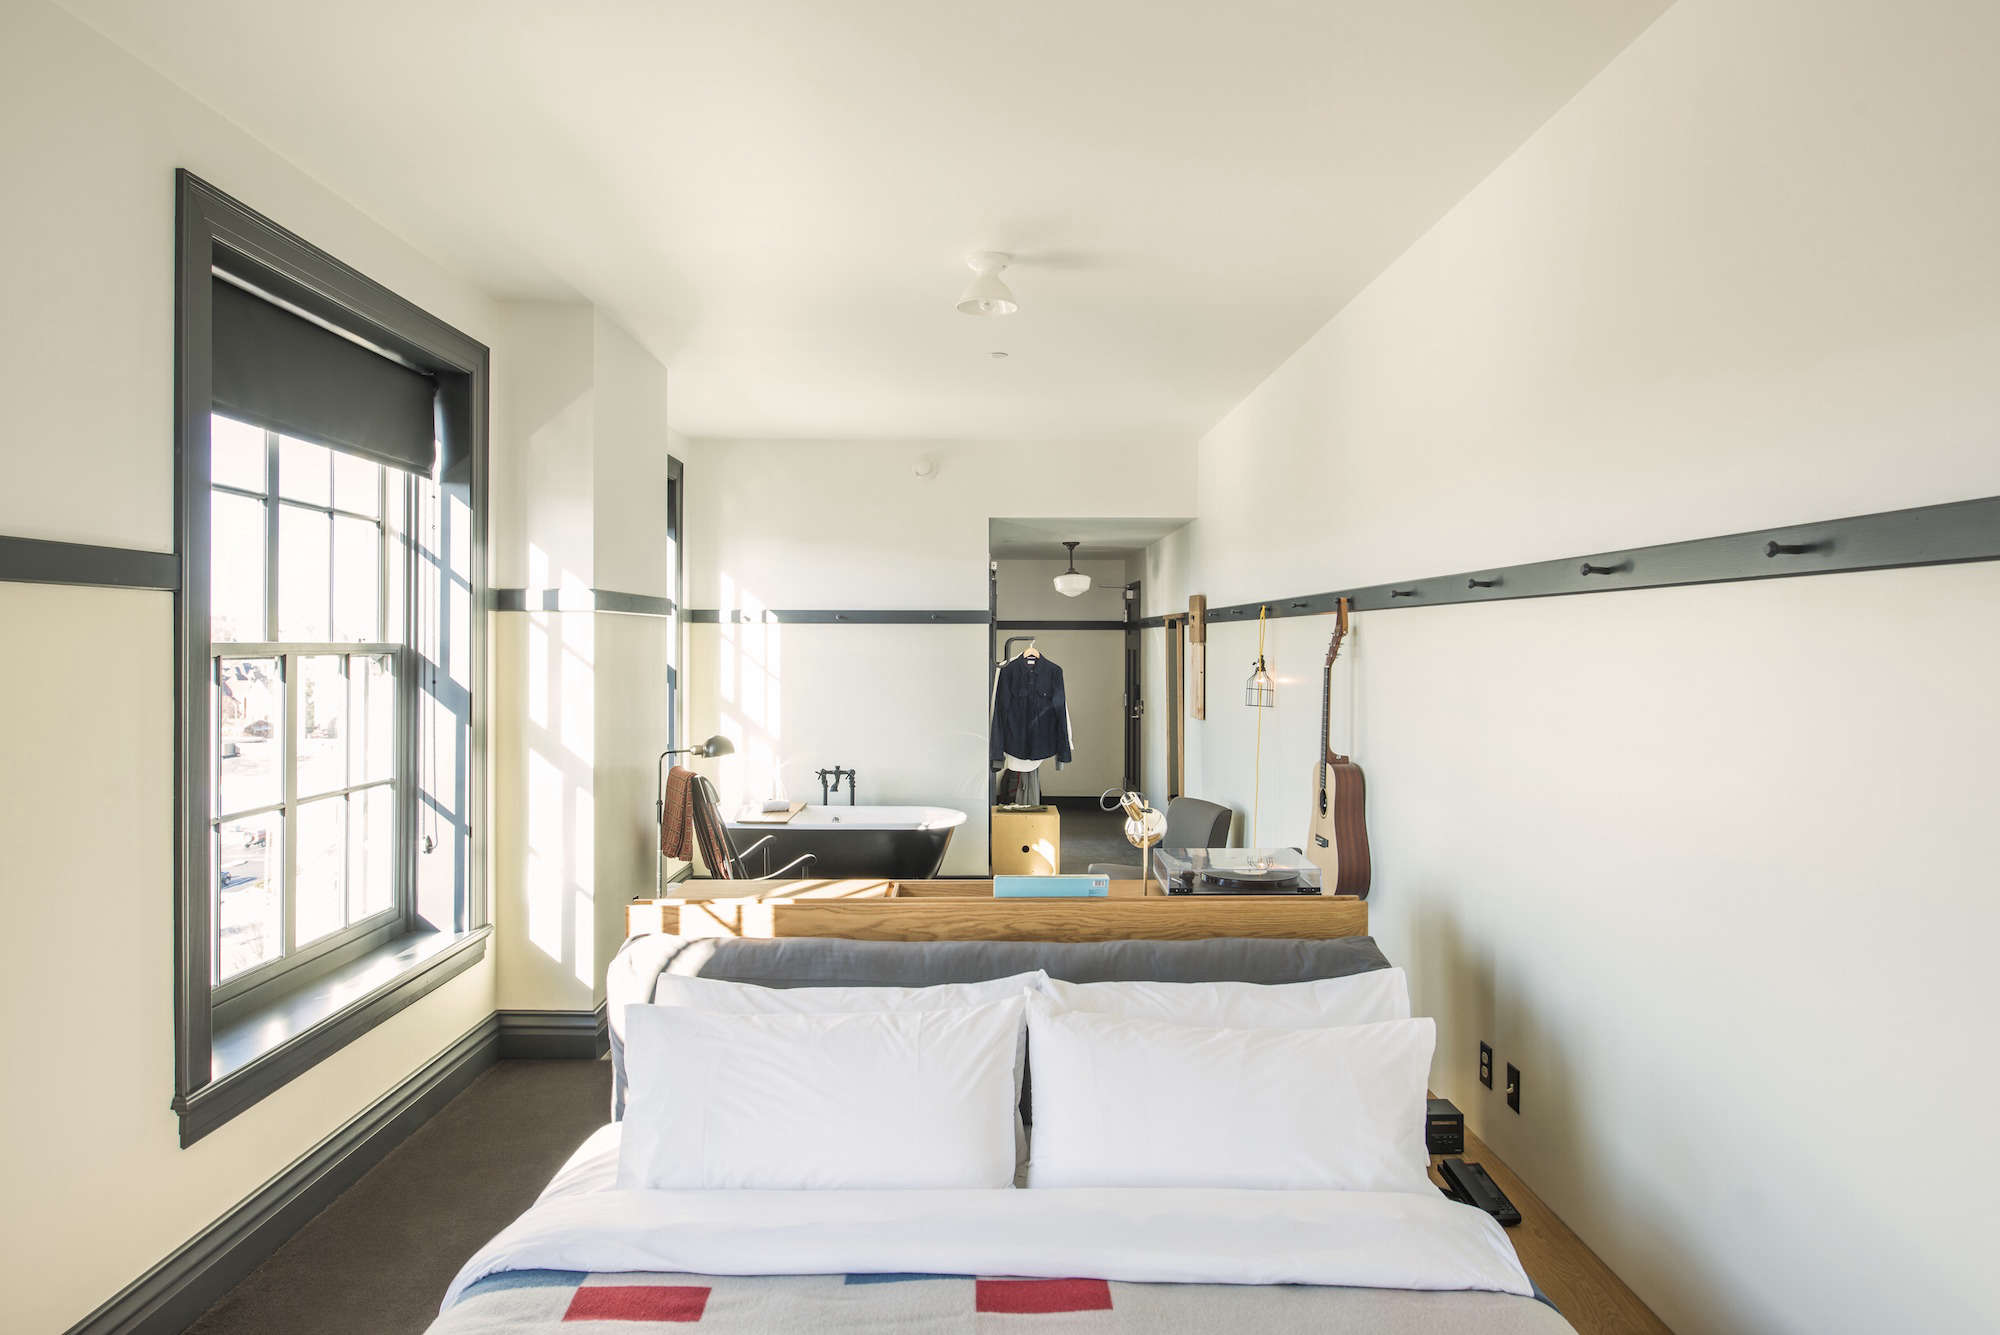 ace hotel pittsburgh rob larsen remodelista 01 9